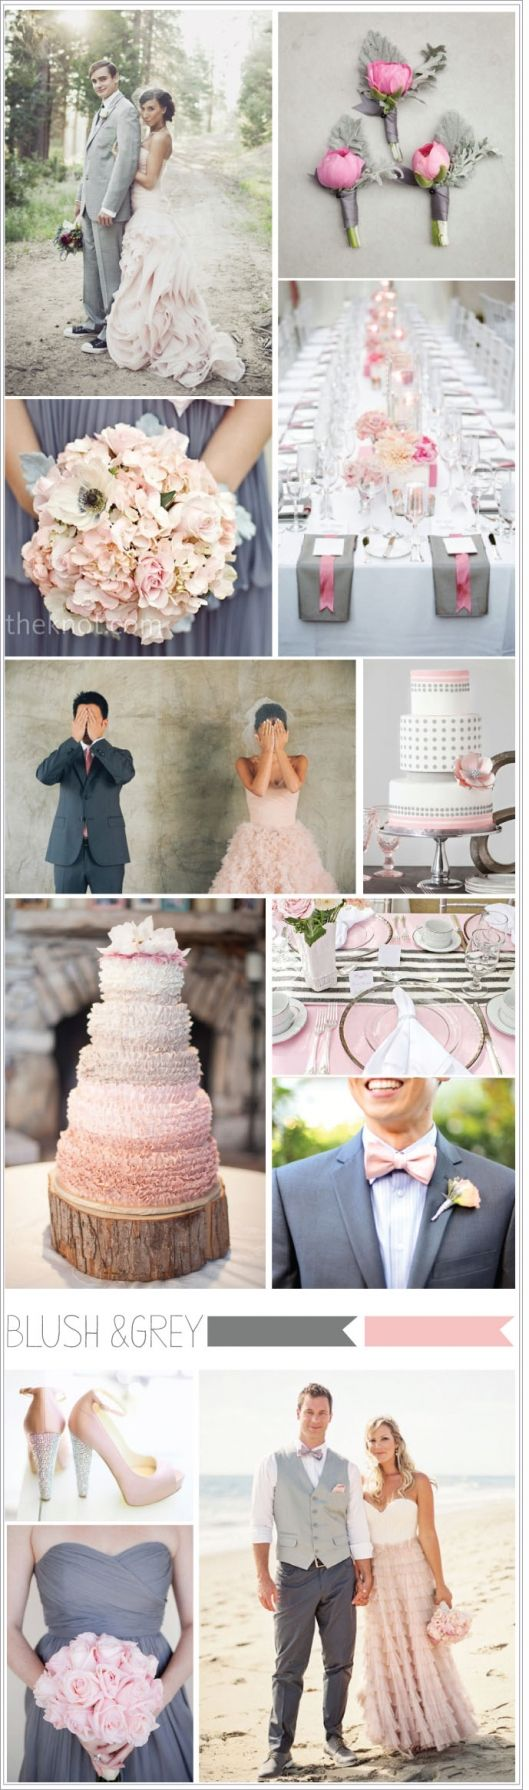 beautiful pink and grey wedding inspiration - enfianced